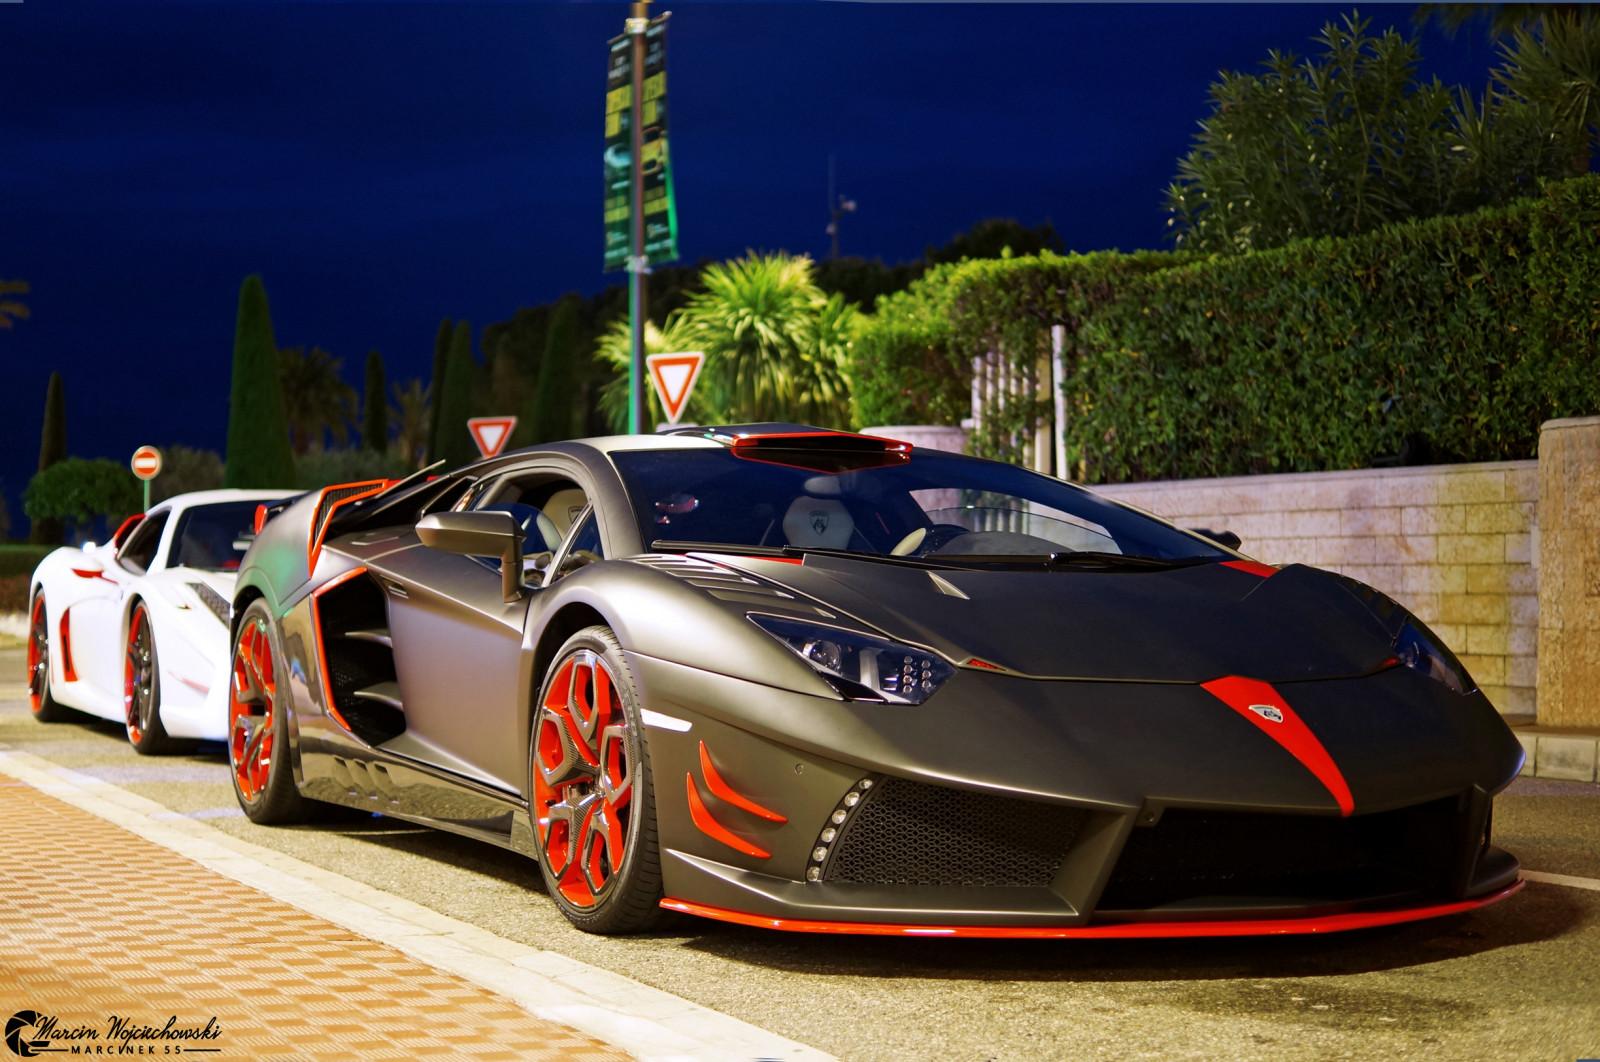 Lamborghini Aventador Cars Wallpapers Wallpaper Red England Orange White Black Paris